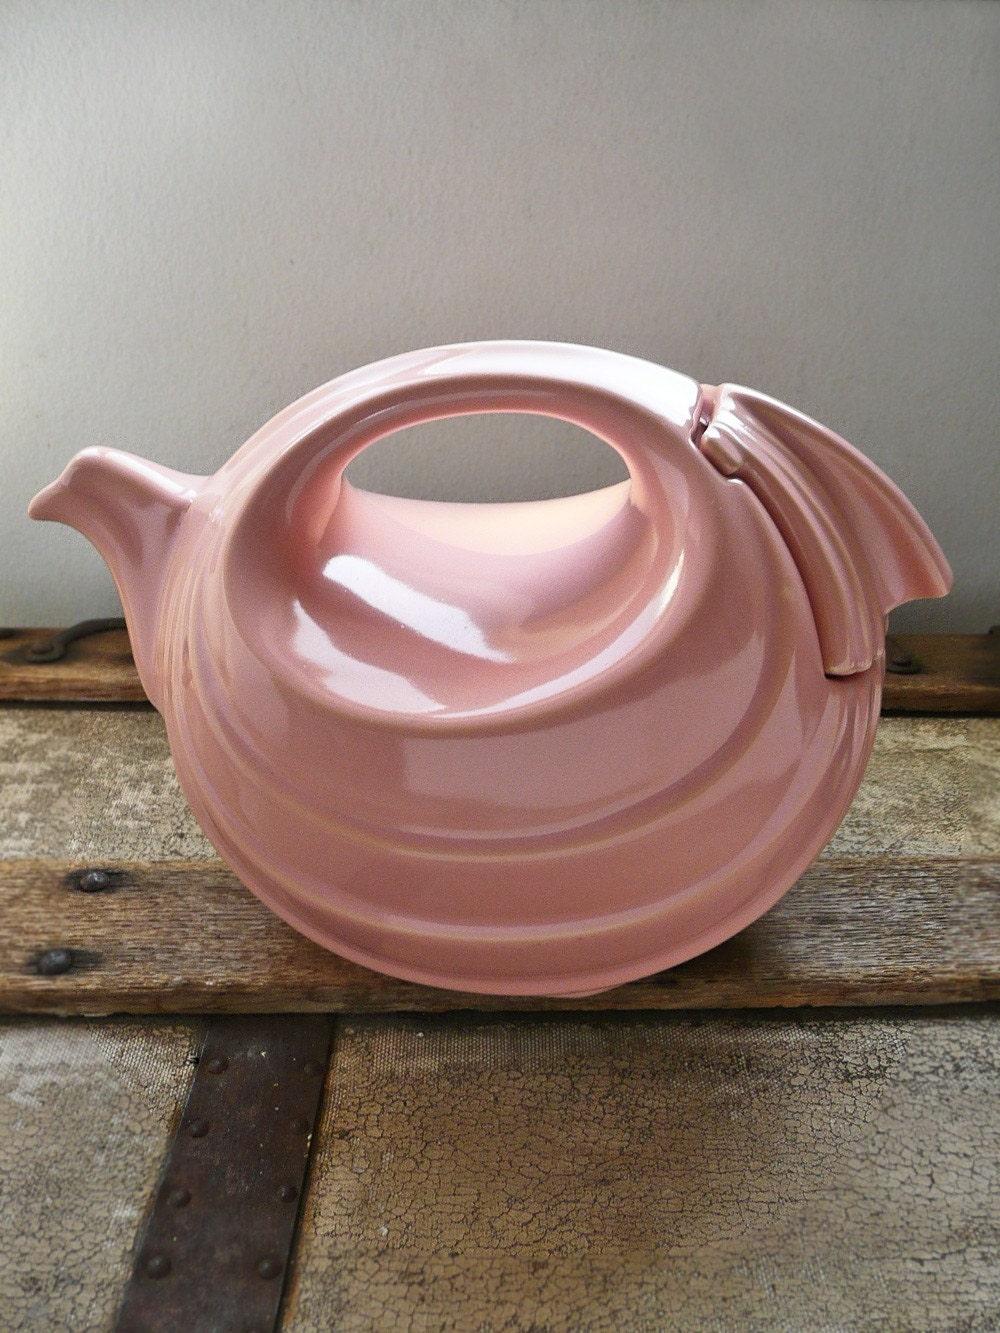 Vintage Hall Teapot Rhythm Design In Pink By Curiositycabinet